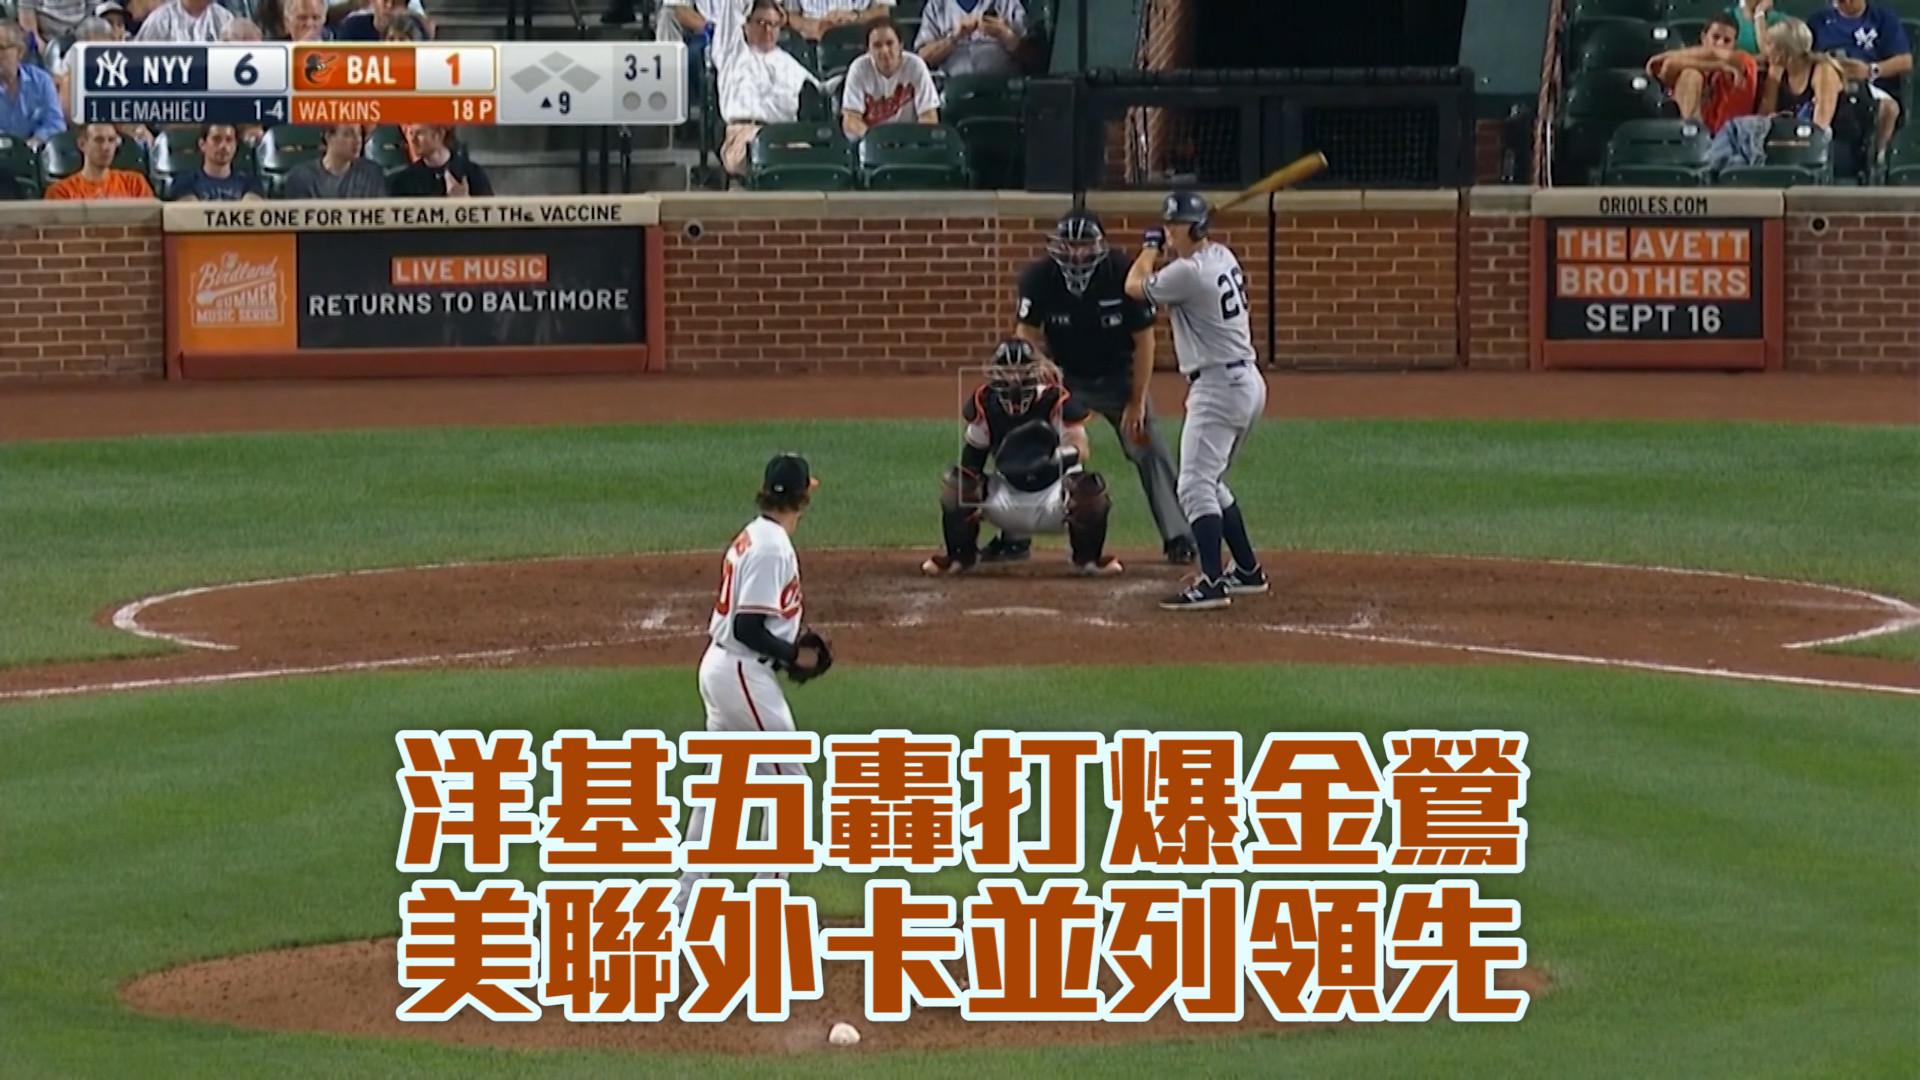 【MLB看愛爾達】洋基五轟打爆金鶯 美聯外卡並列領先 9/15